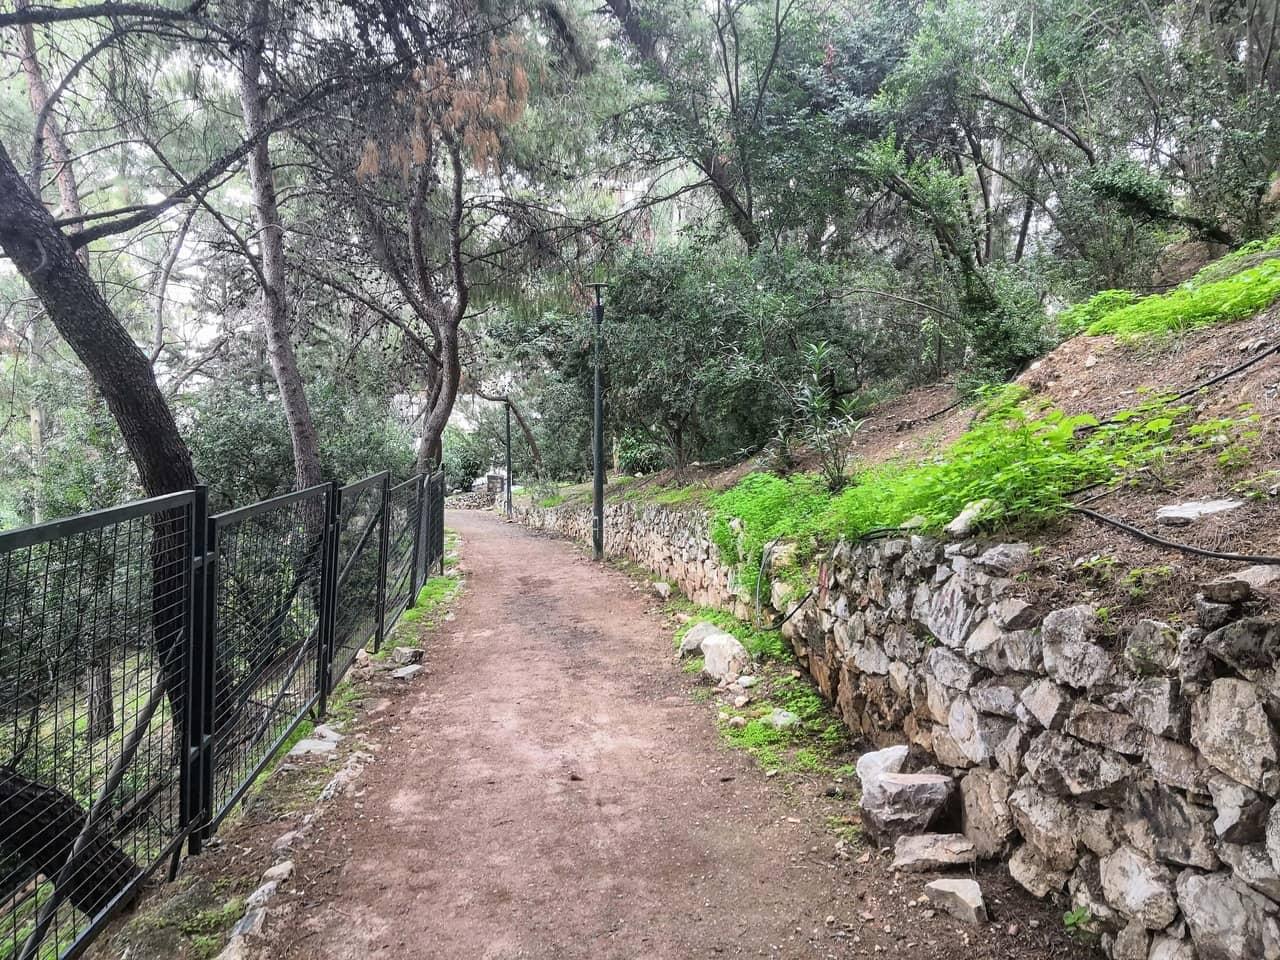 Green pathway on a hillside